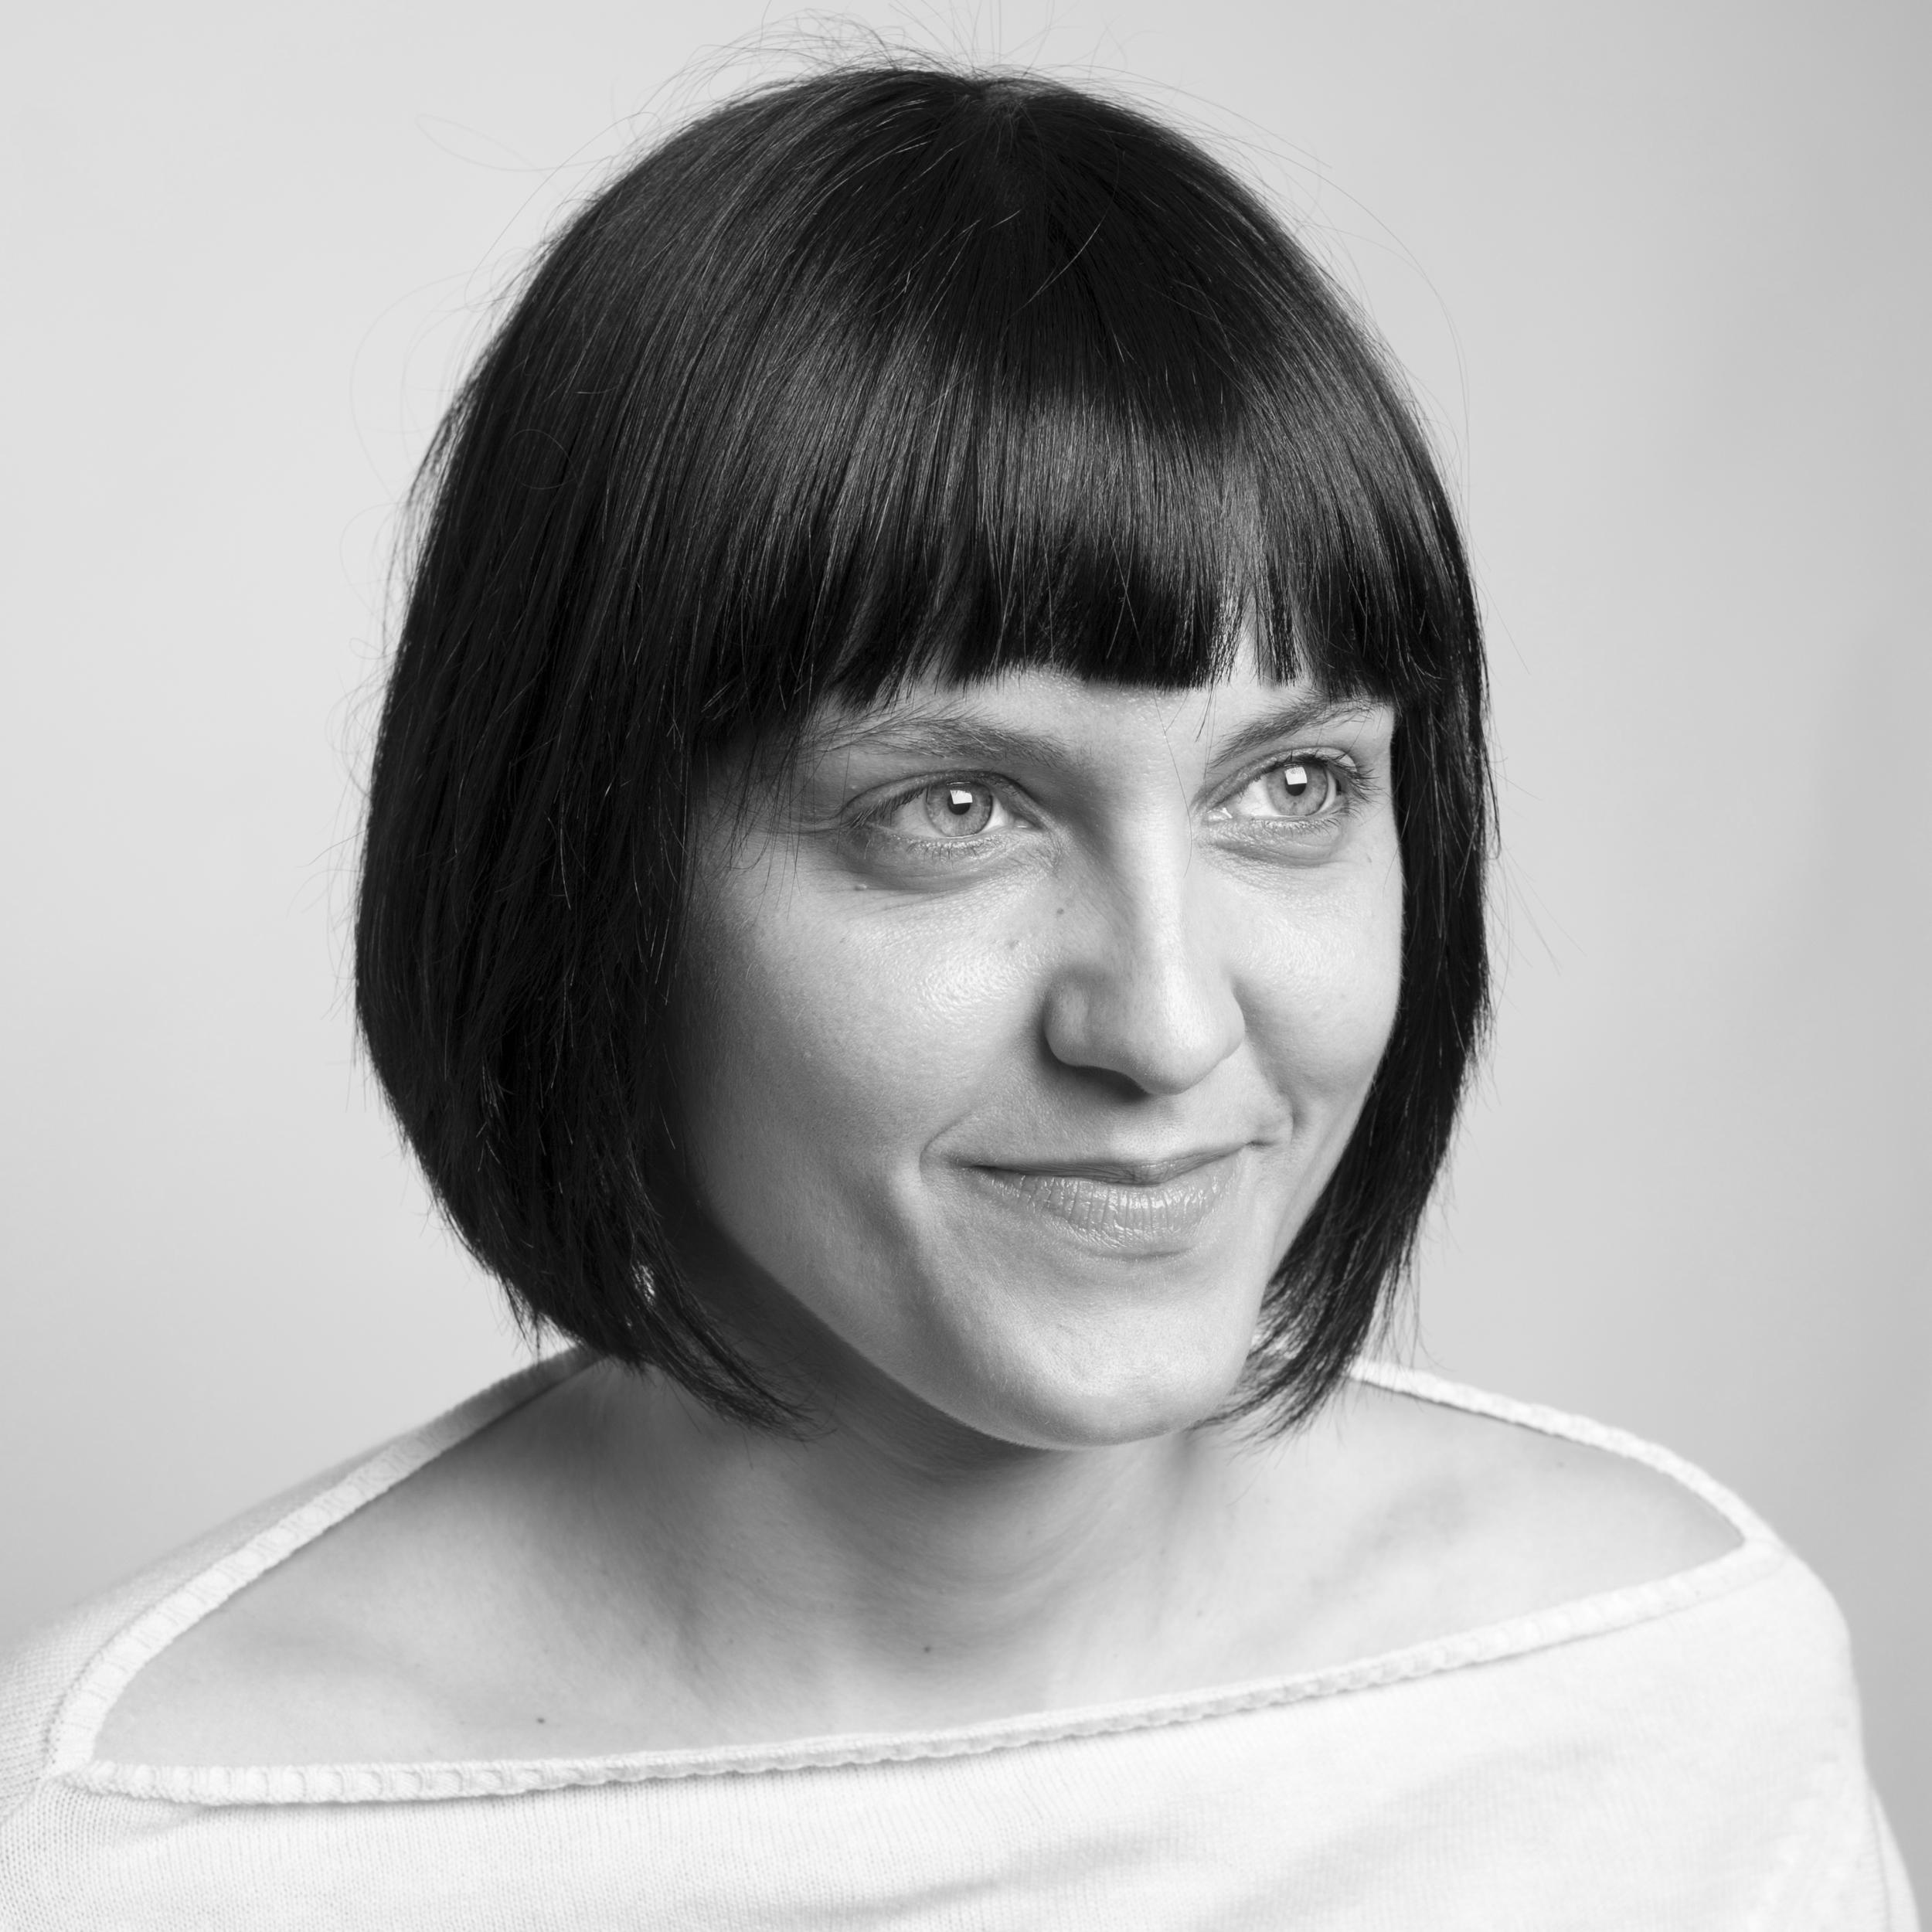 Marta Rabazo